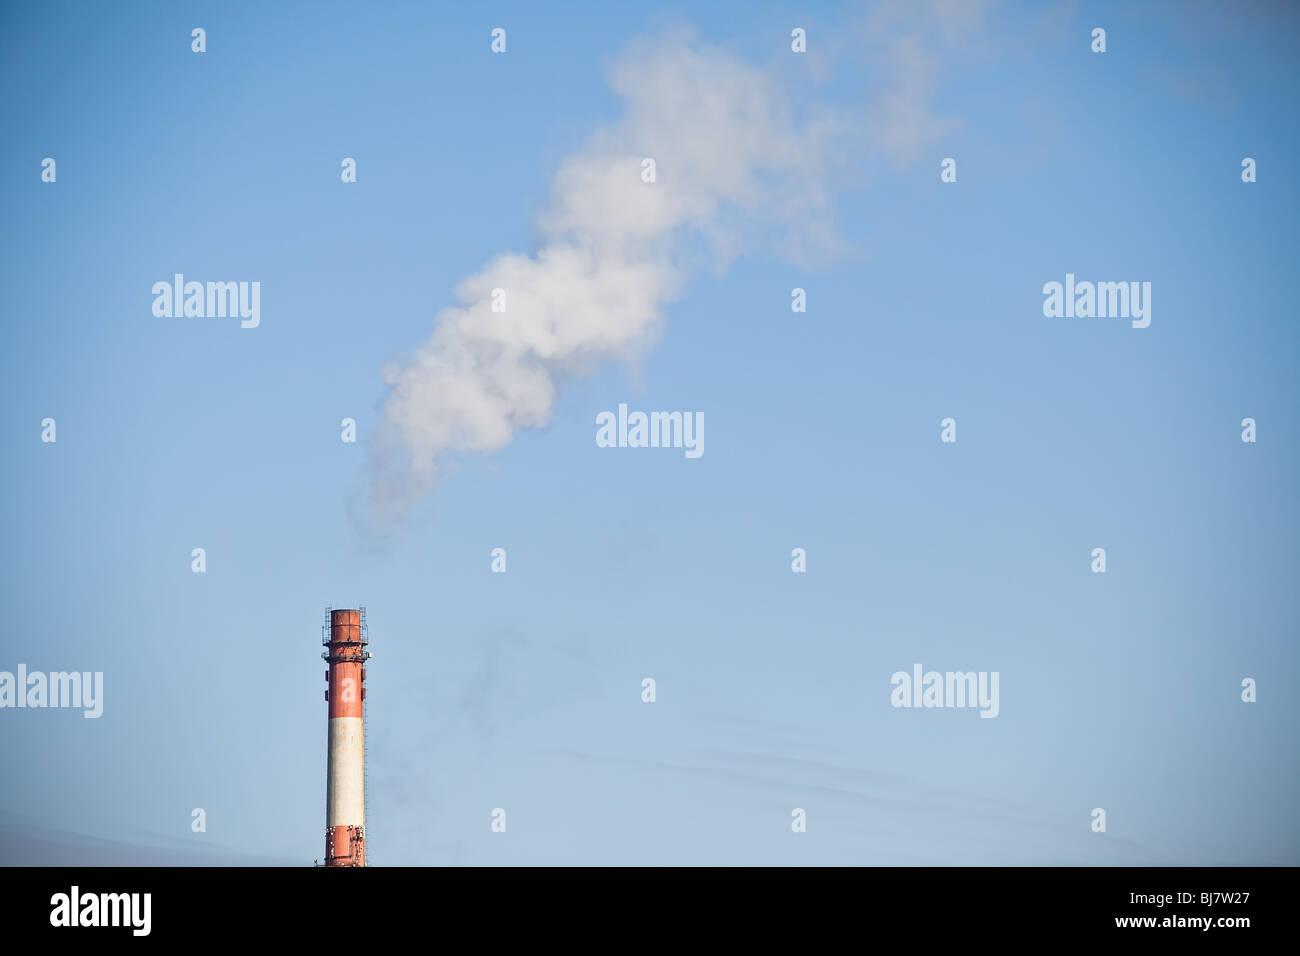 Chimney smoke as a CO2 symbol - global warming - Stock Image